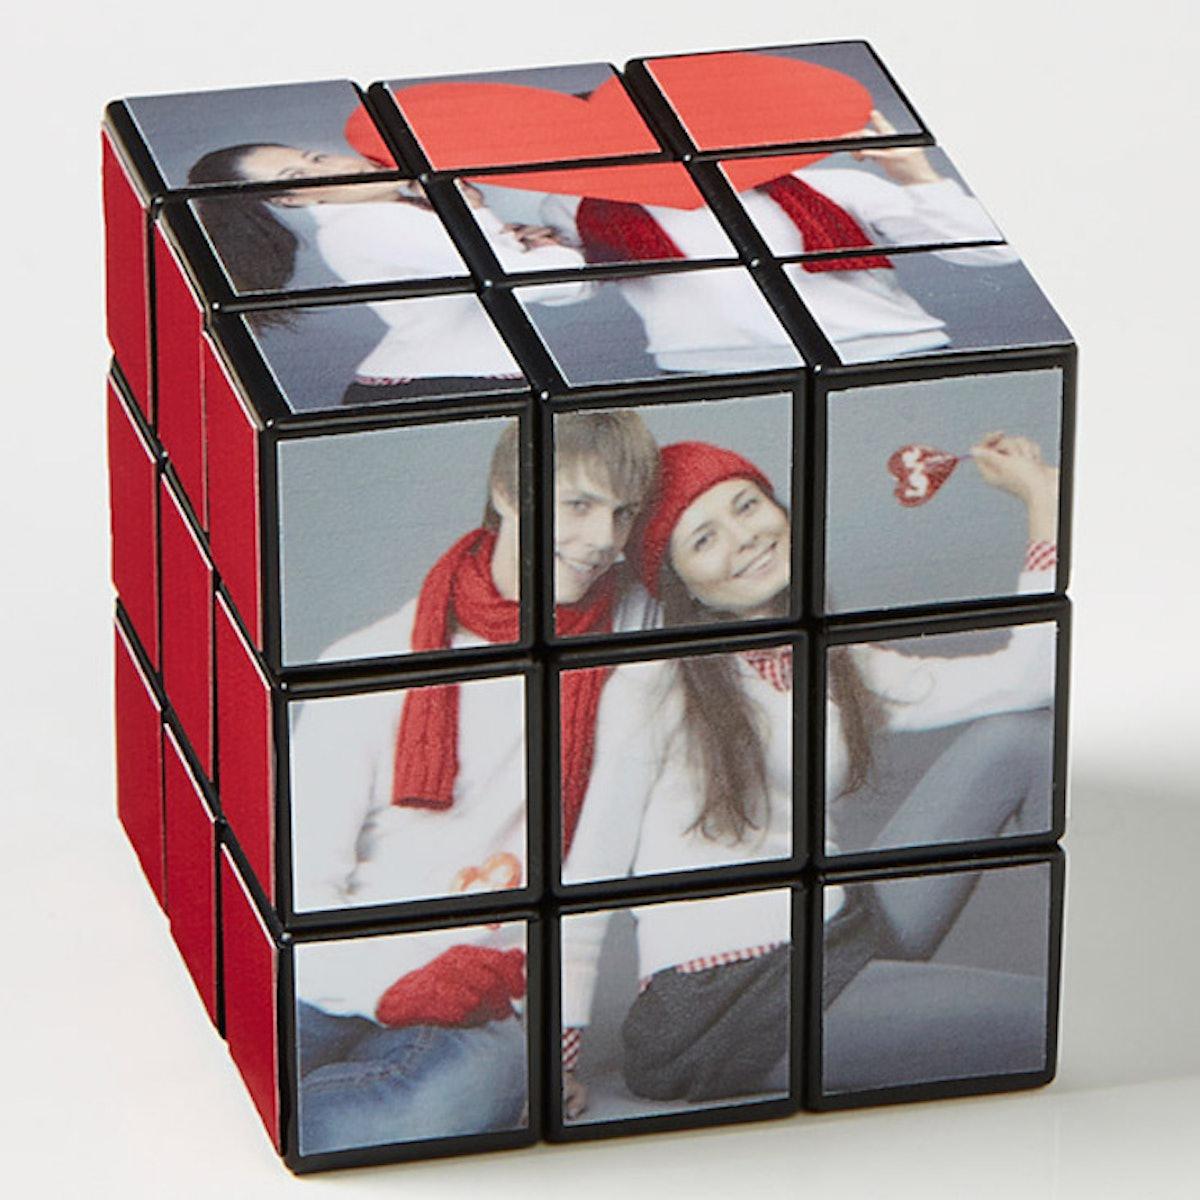 Cute Couple Photo Rubik's® Cube